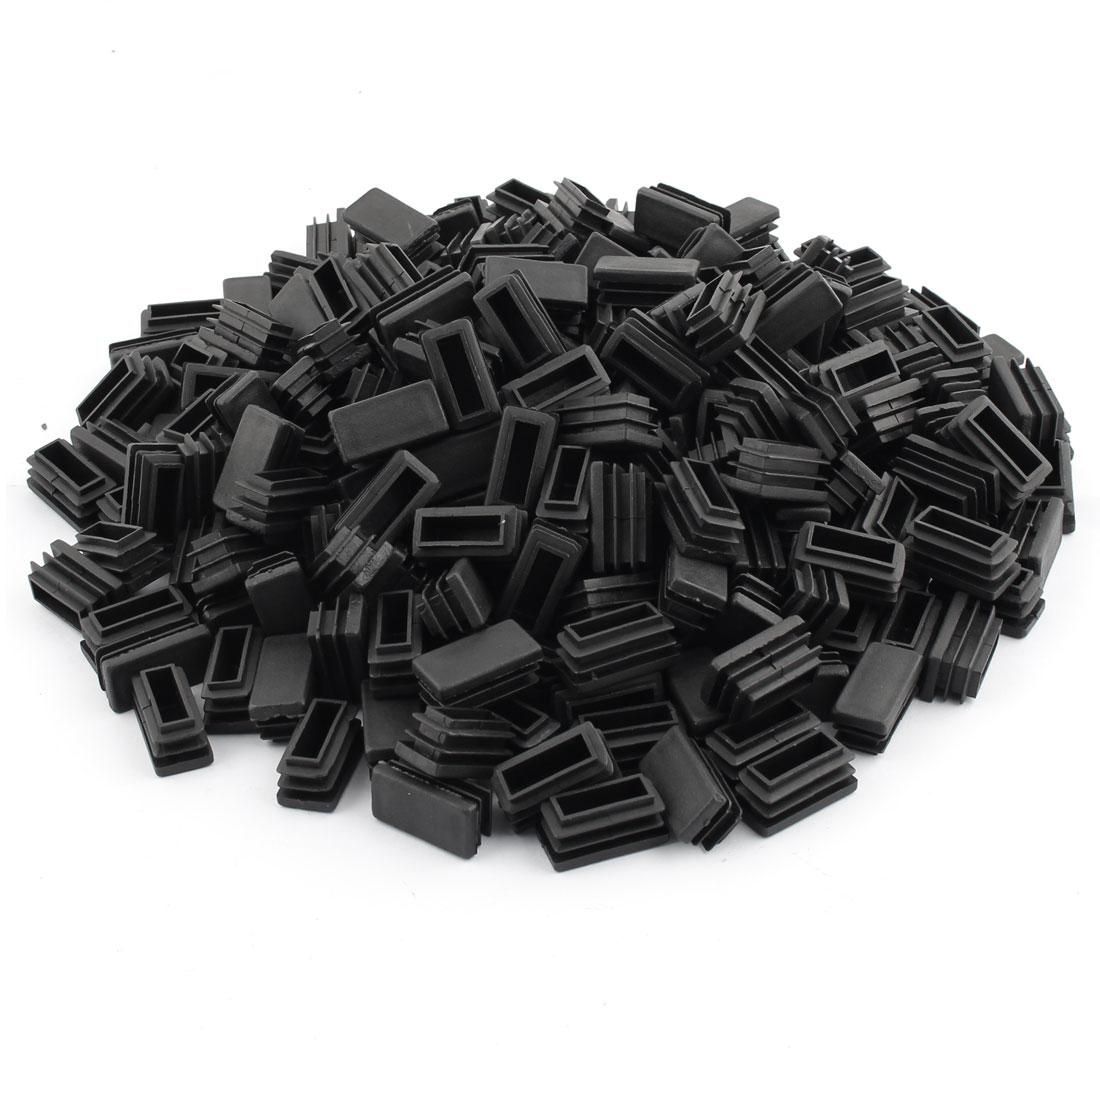 Home Office Plastic Rectangle Shaped Table Legs Tube Insert Black 30 x 15mm 250 Pcs